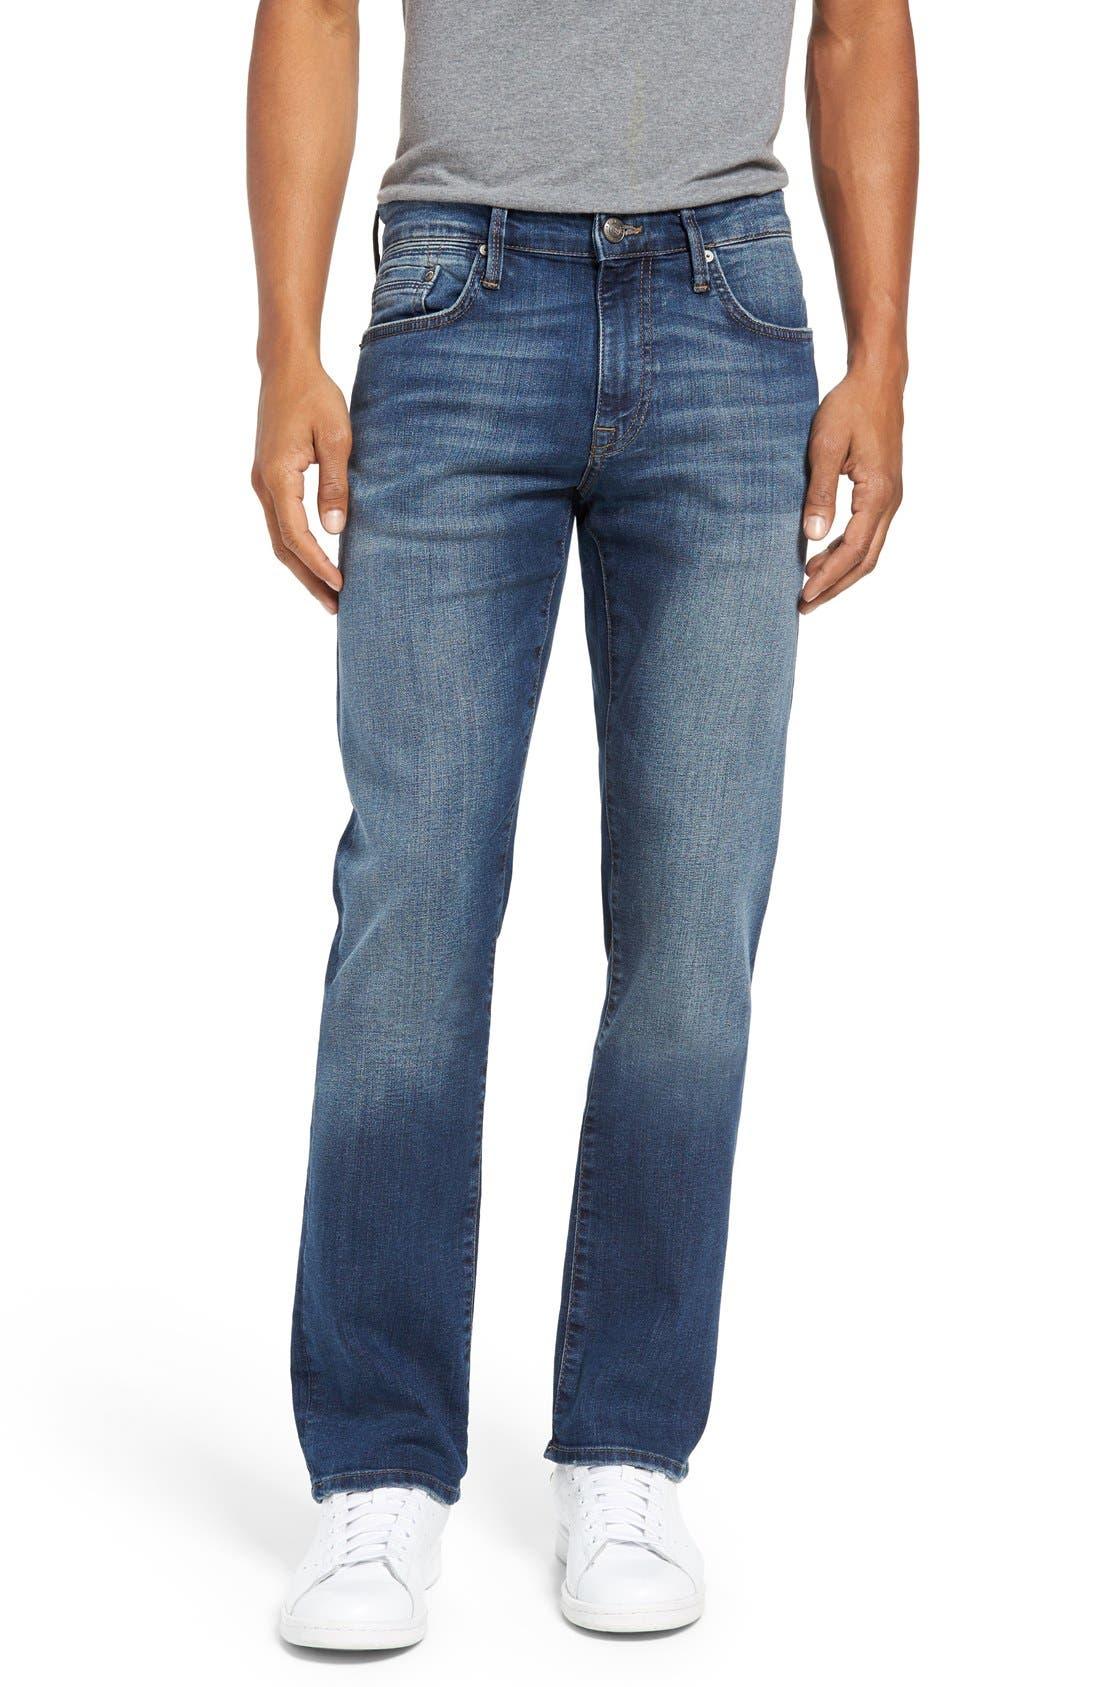 Alternate Image 1 Selected - Mavi Jeans 'Zach' Straight Leg Jeans (Mid Blue)